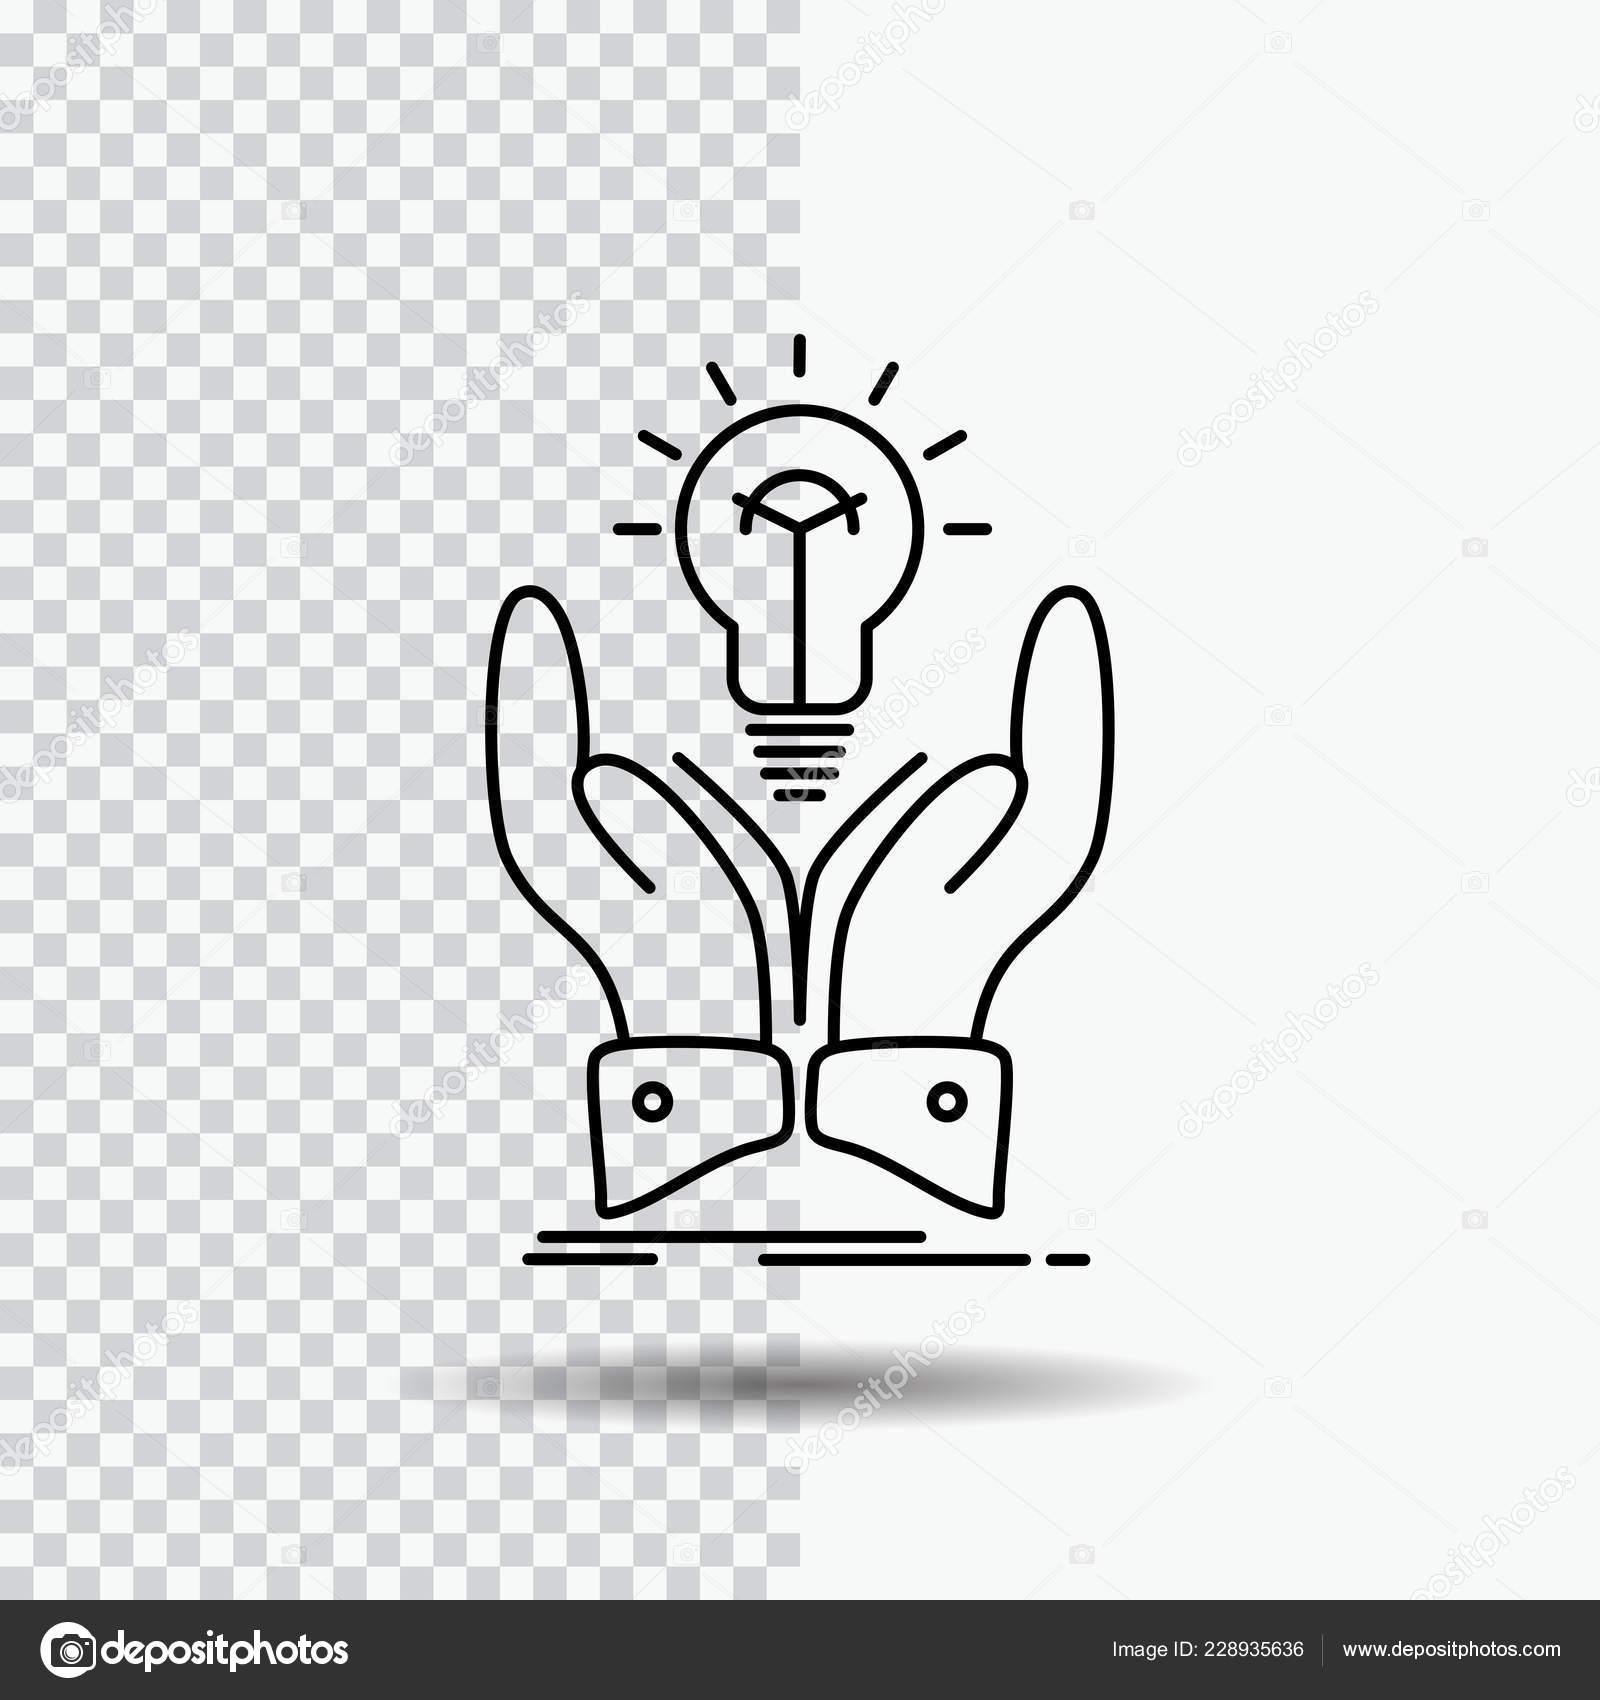 Idea Ideas Creative Share Hands Line Icon Transparent